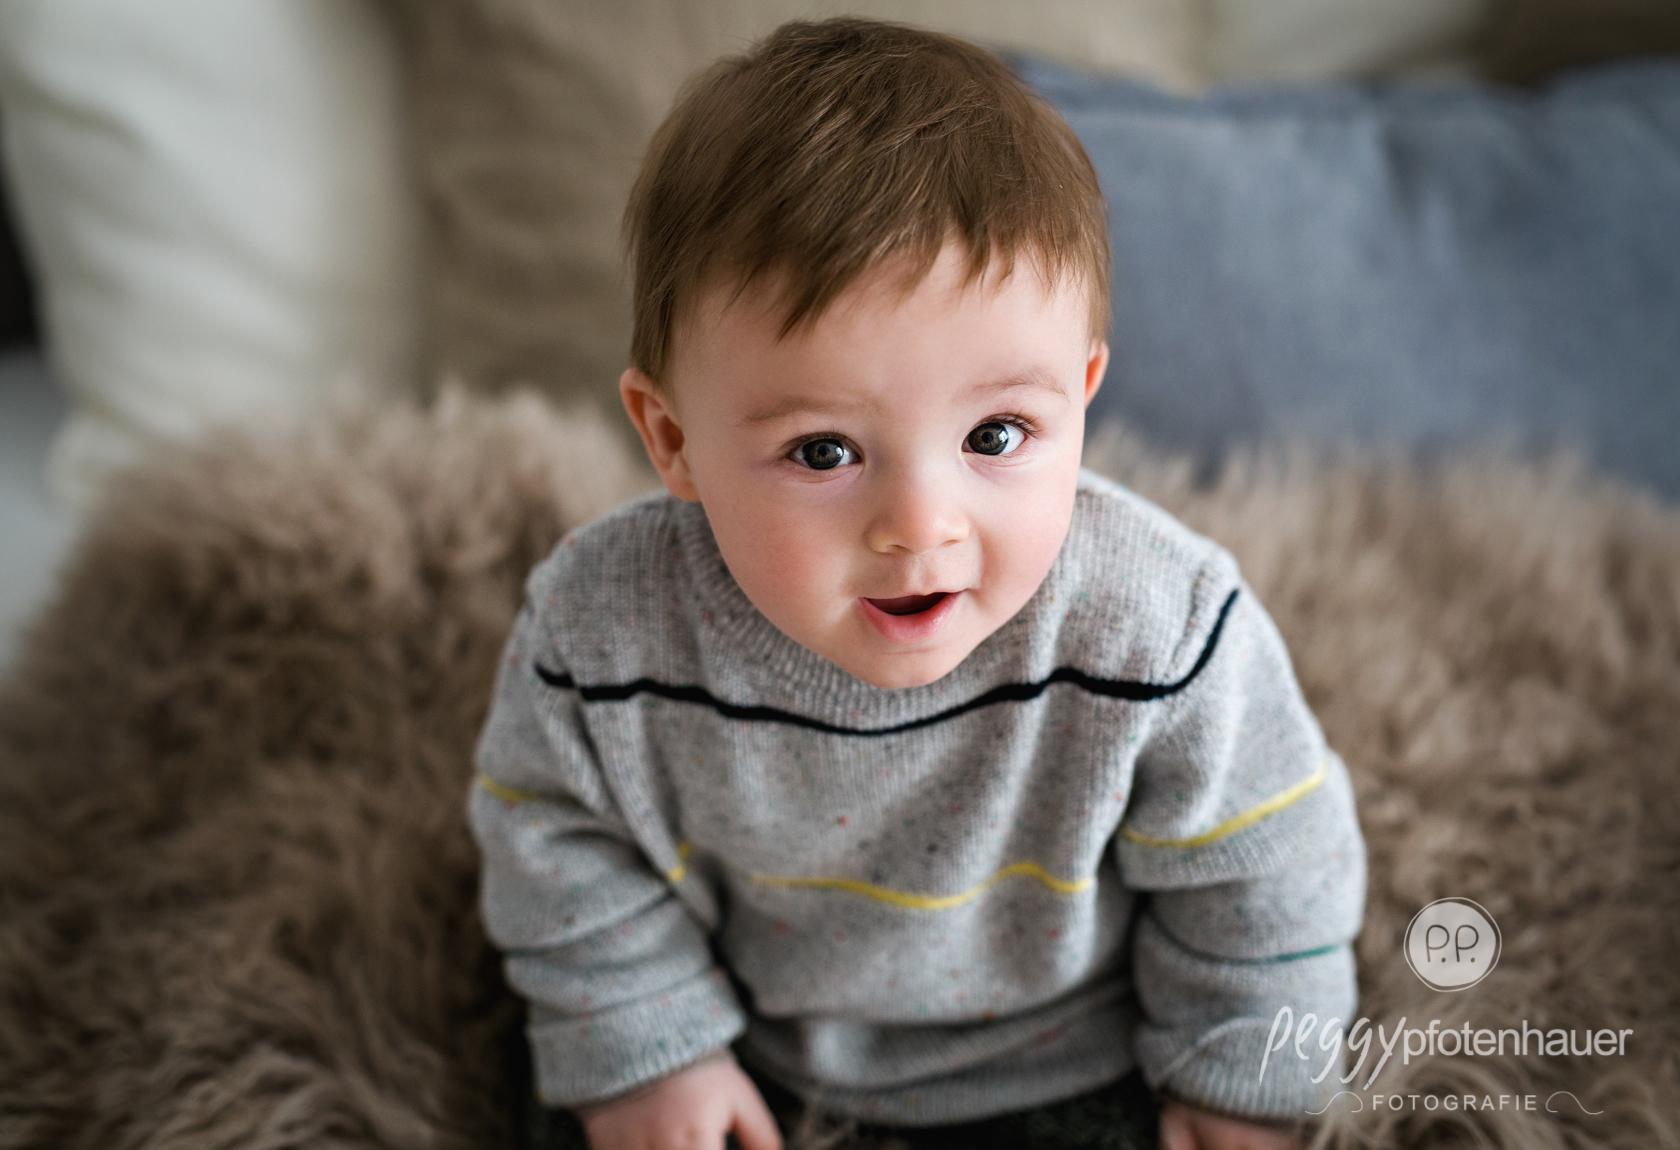 Babyphotos Peggy Pfotenhauer Fotografie